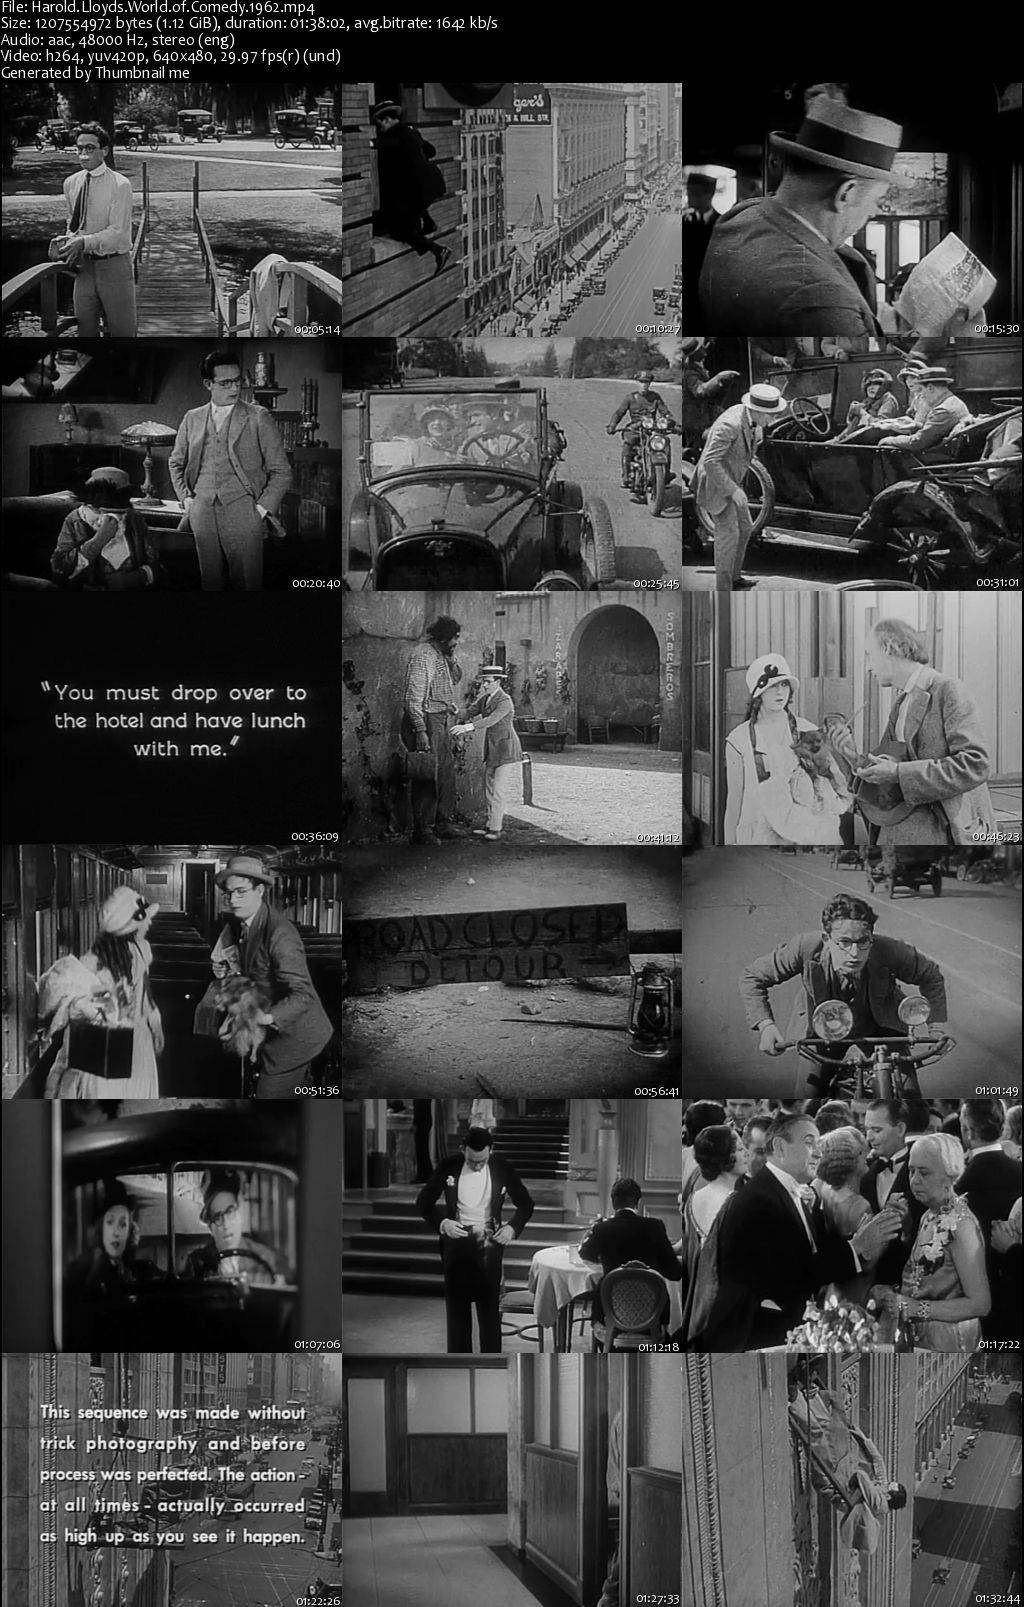 World of Comedy / Harold Lloyd's World of Comedy (1962)